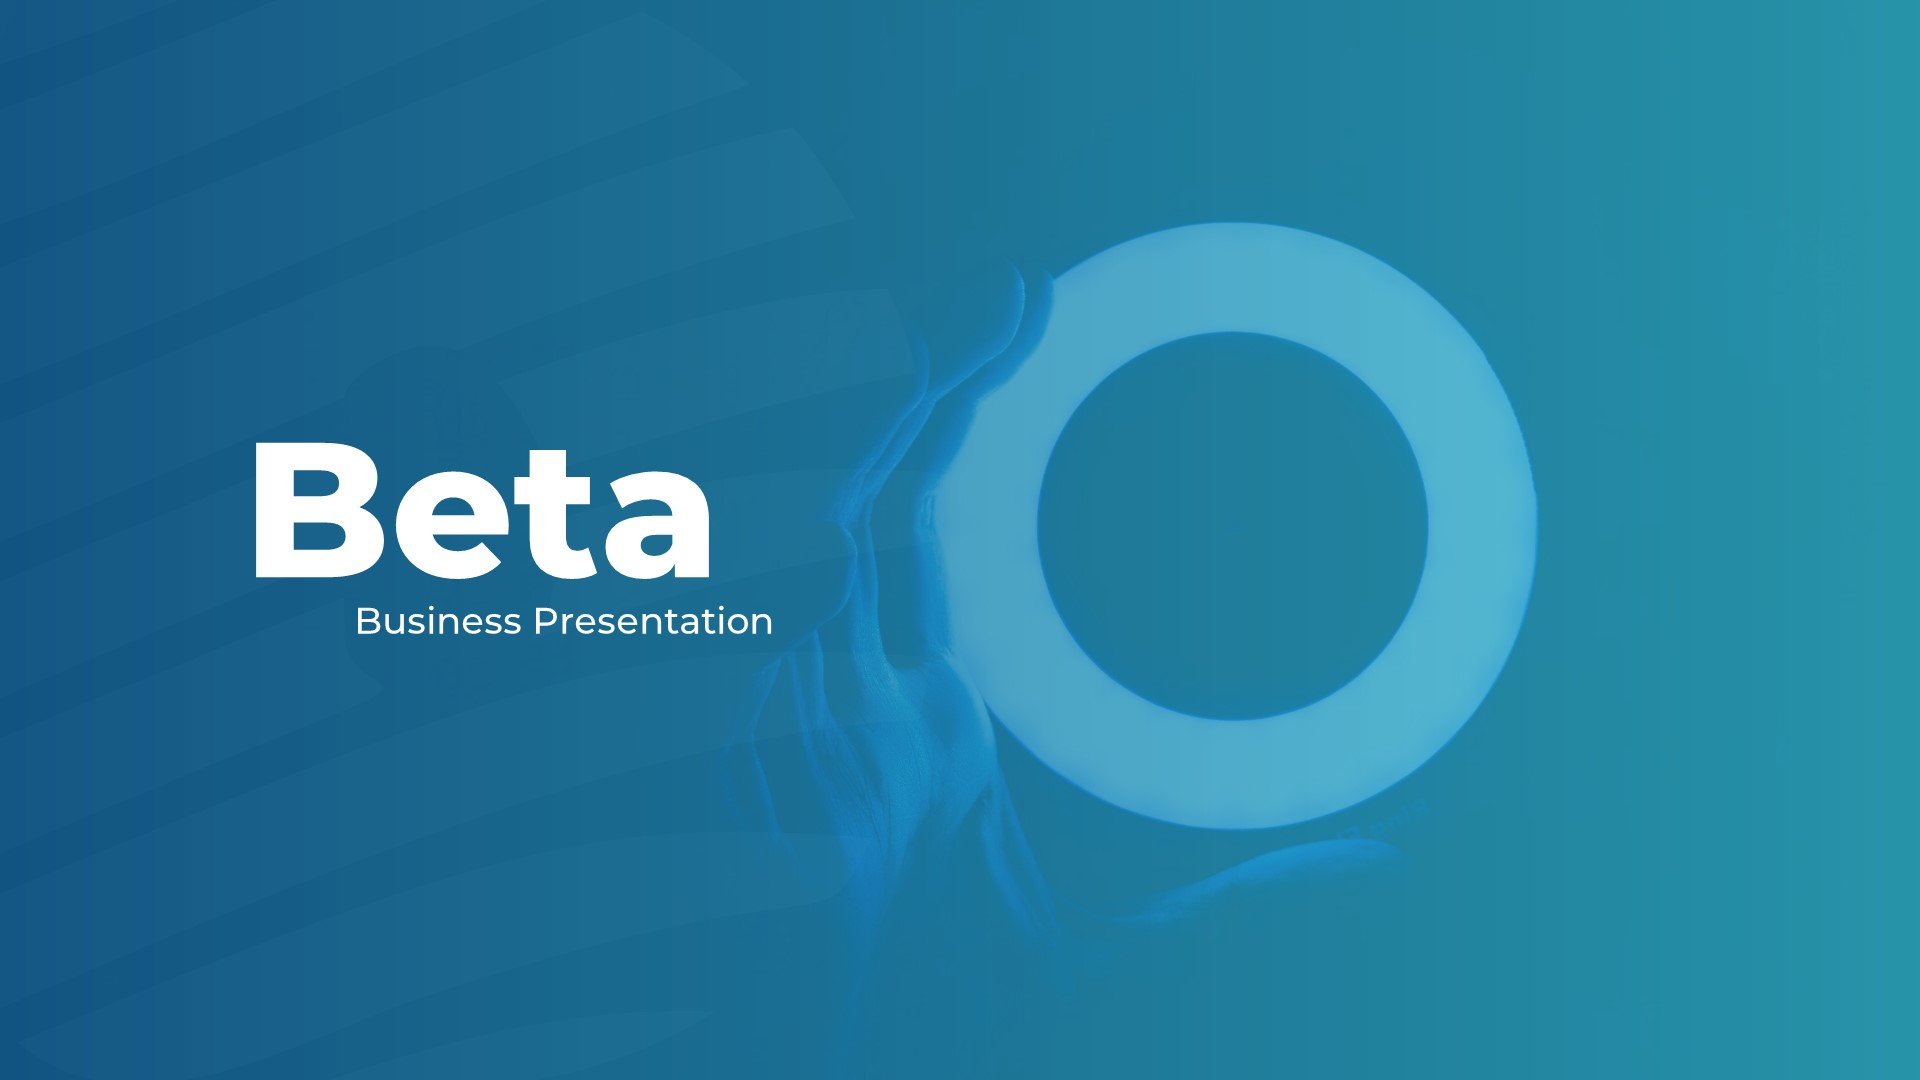 Beta PowerPoint Presentation Template